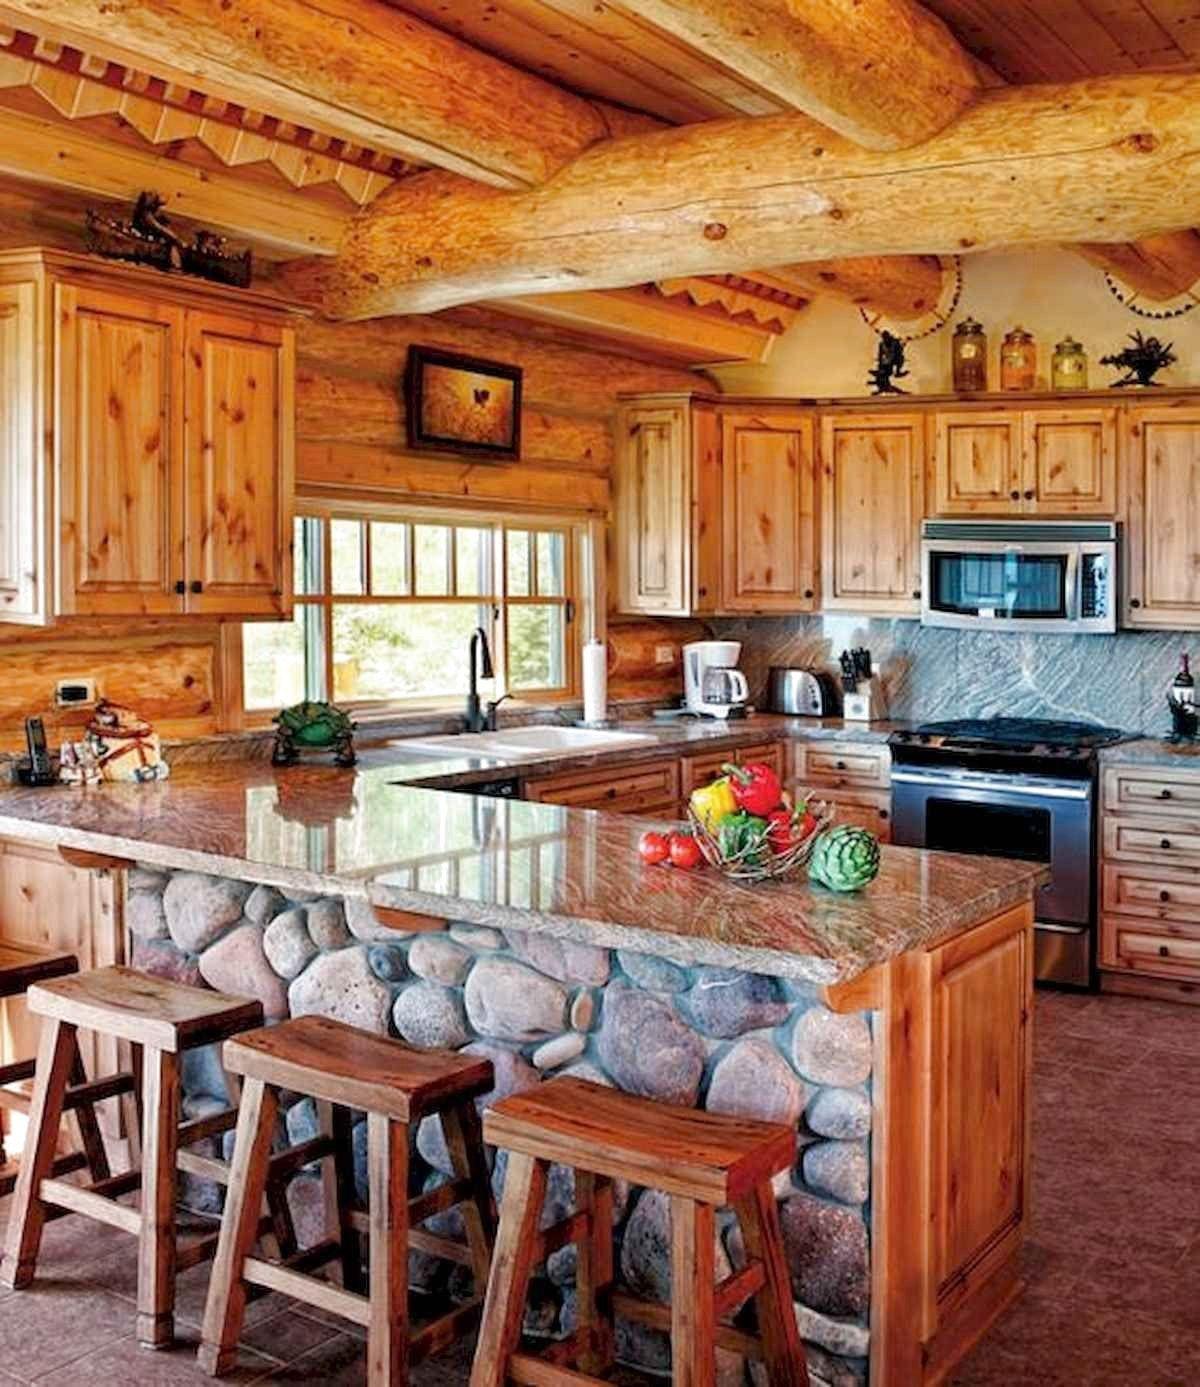 56 Favourite Log Cabin Homes Modern Design Ideas Home Garden Log Cabin Kitchens Rustic Cabin Kitchens Log Home Kitchens